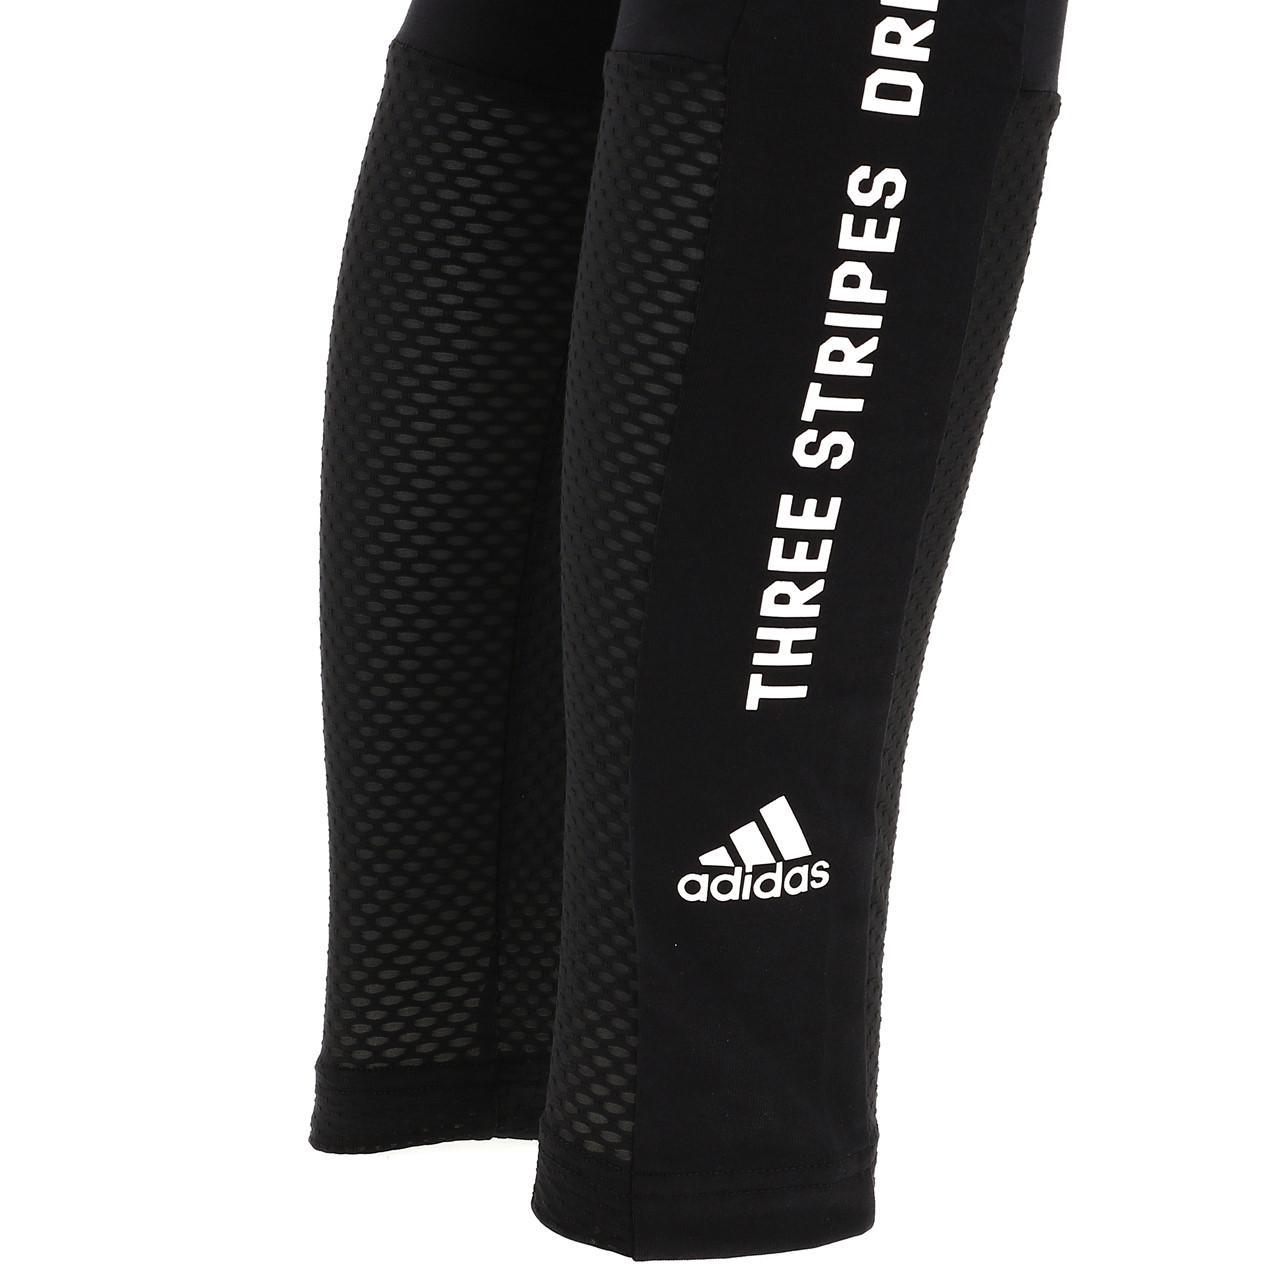 Feinstrumpfhose-Multisport-Adidas-Sid-Tight-Schwarz-L-Schwarz-18239-Neu Indexbild 4